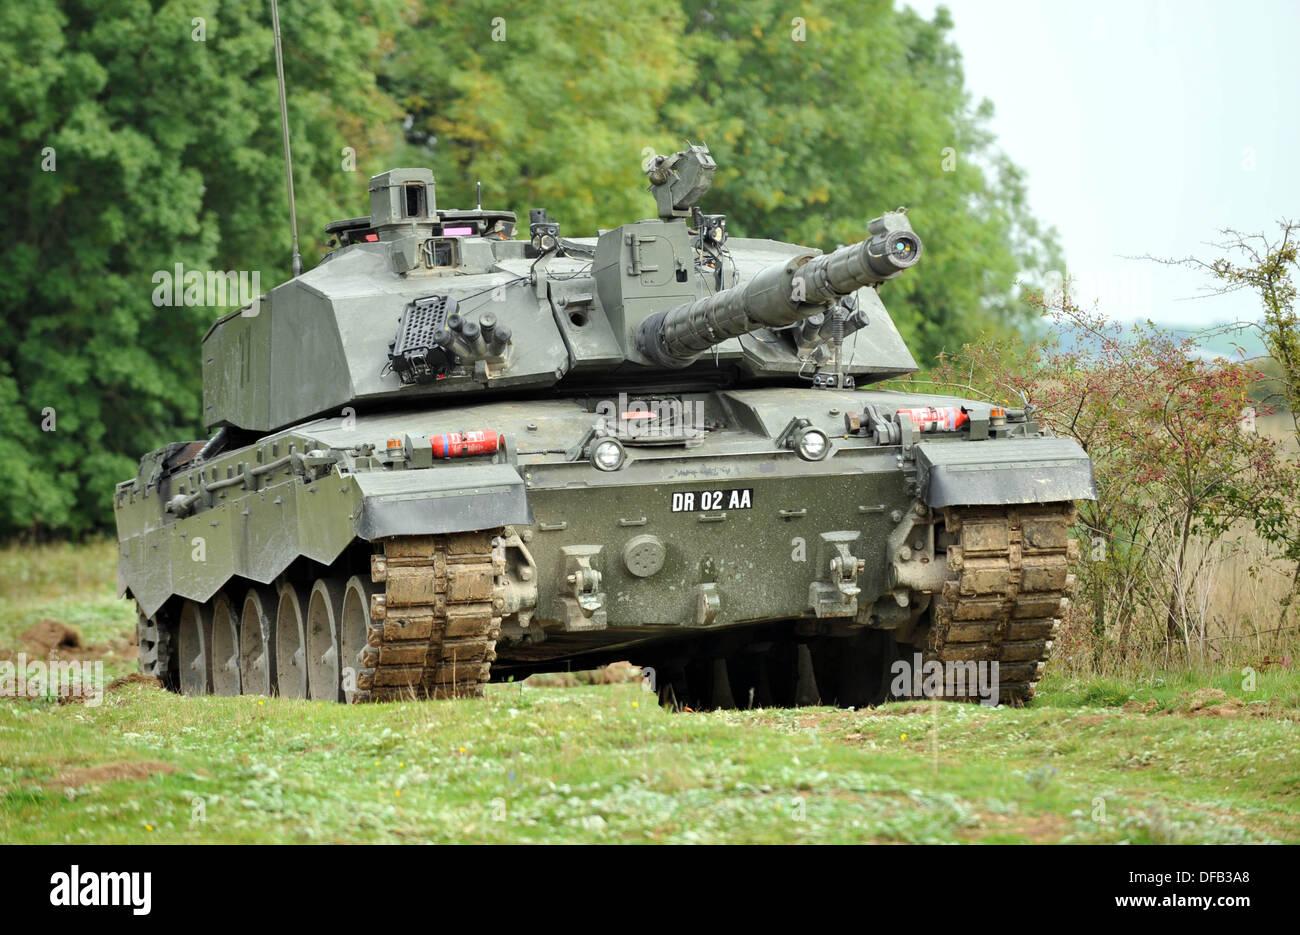 [Obrazek: challenger-mk-ll-battle-tank-british-arm...DFB3A8.jpg]